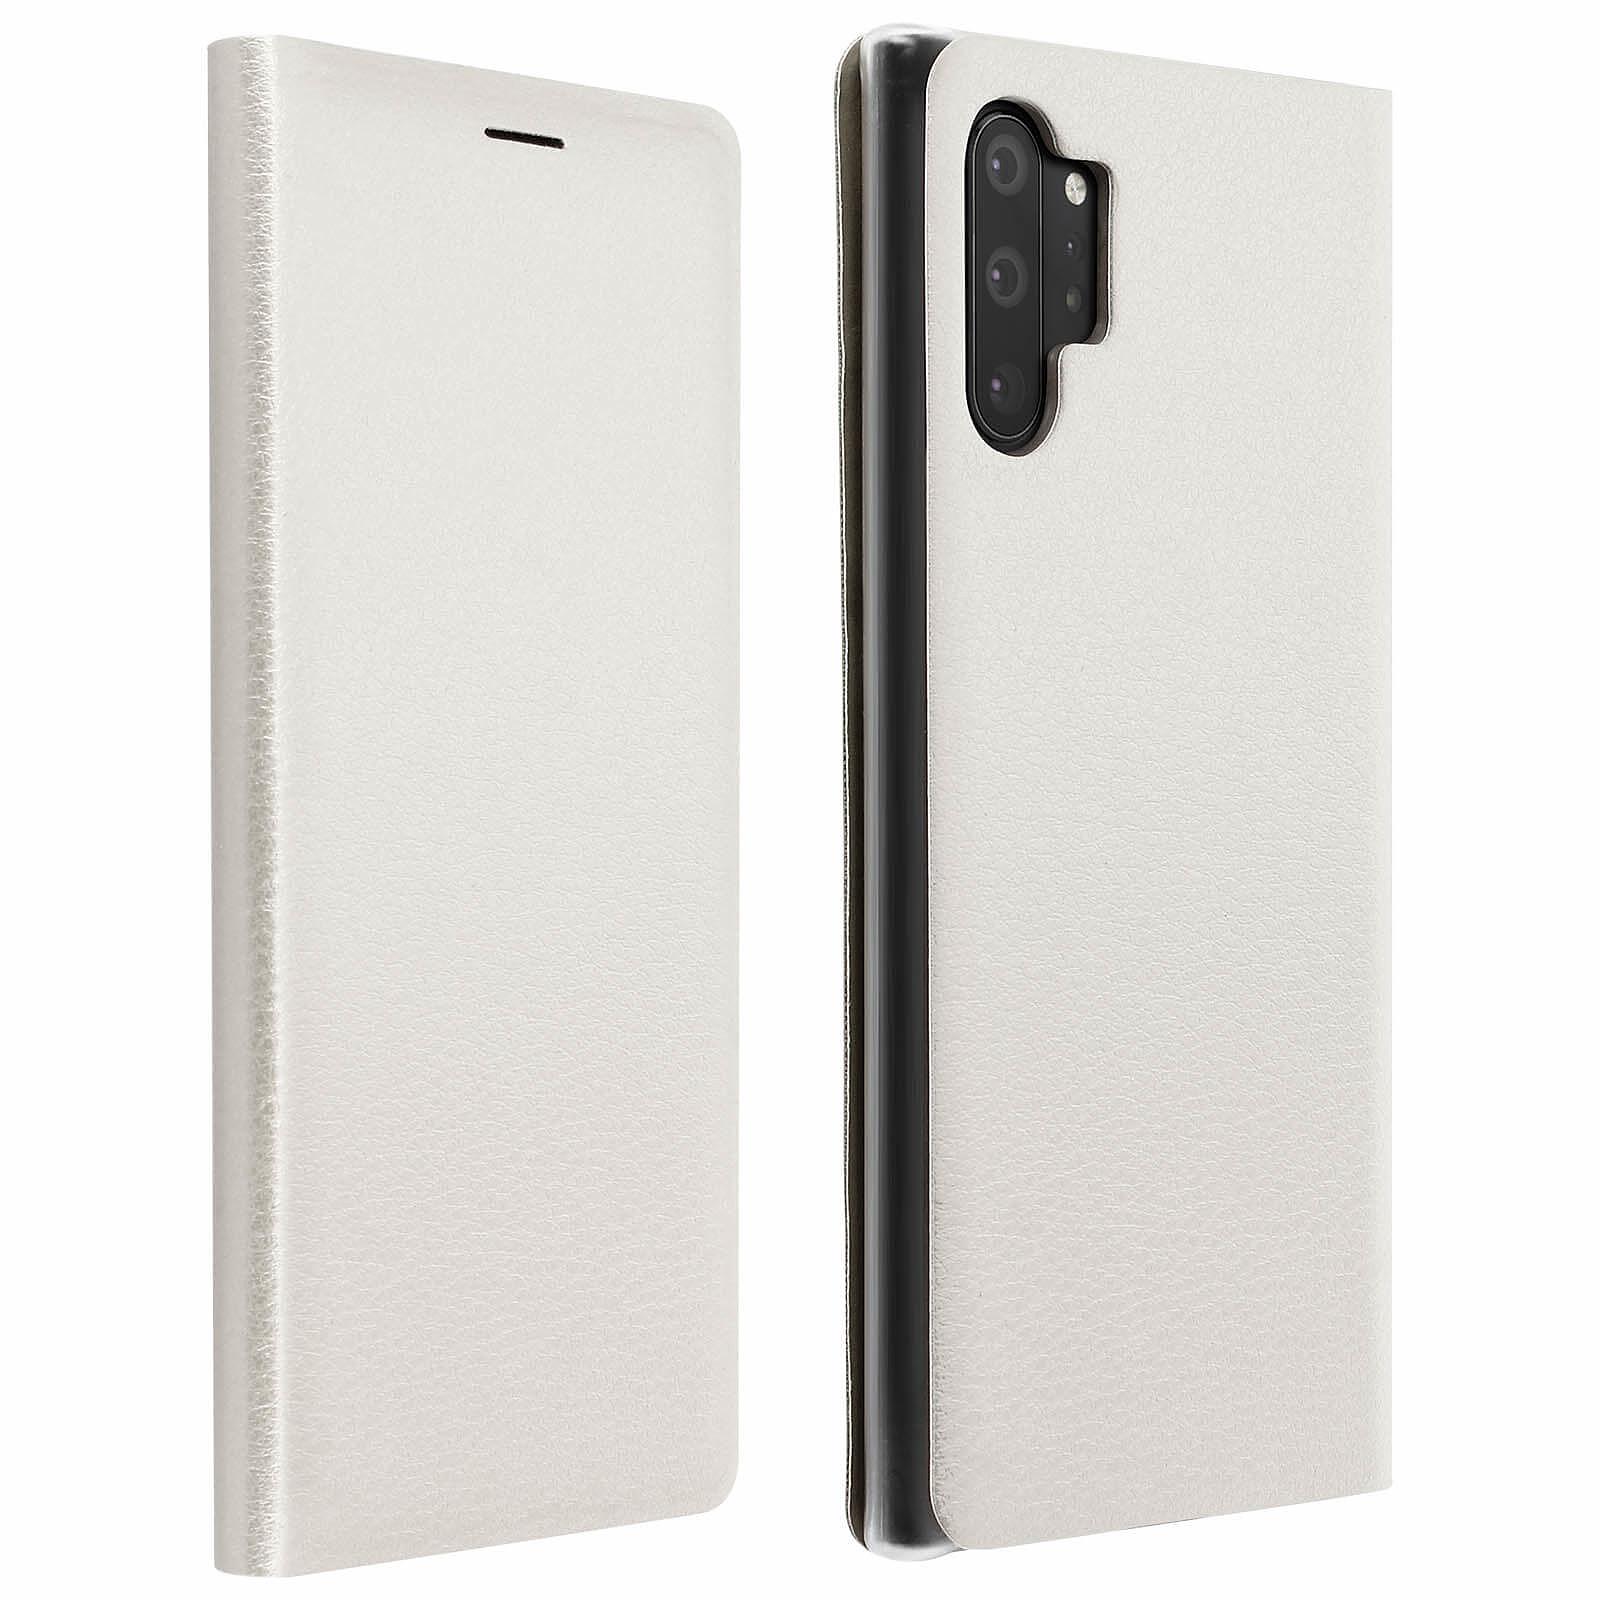 Avizar Etui folio Blanc Porte-Carte pour Samsung Galaxy Note 10 Plus